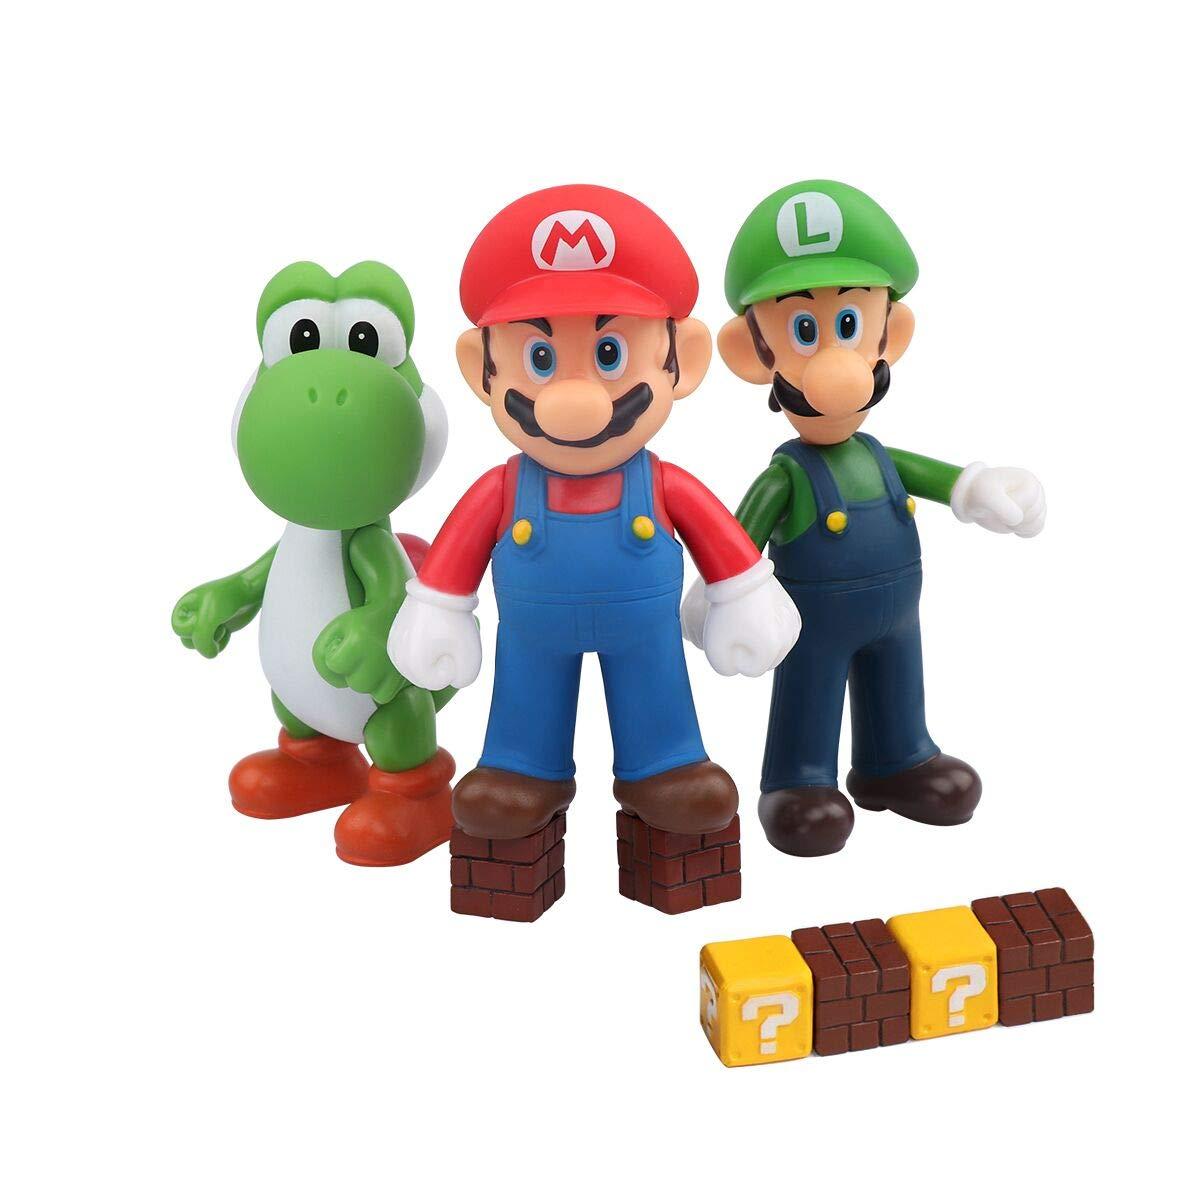 HXDZFX 9 PCS Mario and Luigi Toys Figurines - Super Mario Action Figures Toys - Yoshi & Mario Bros - Mario Toy for Boys - Premium Mario Cake Toppers Decoration by HXDZFX